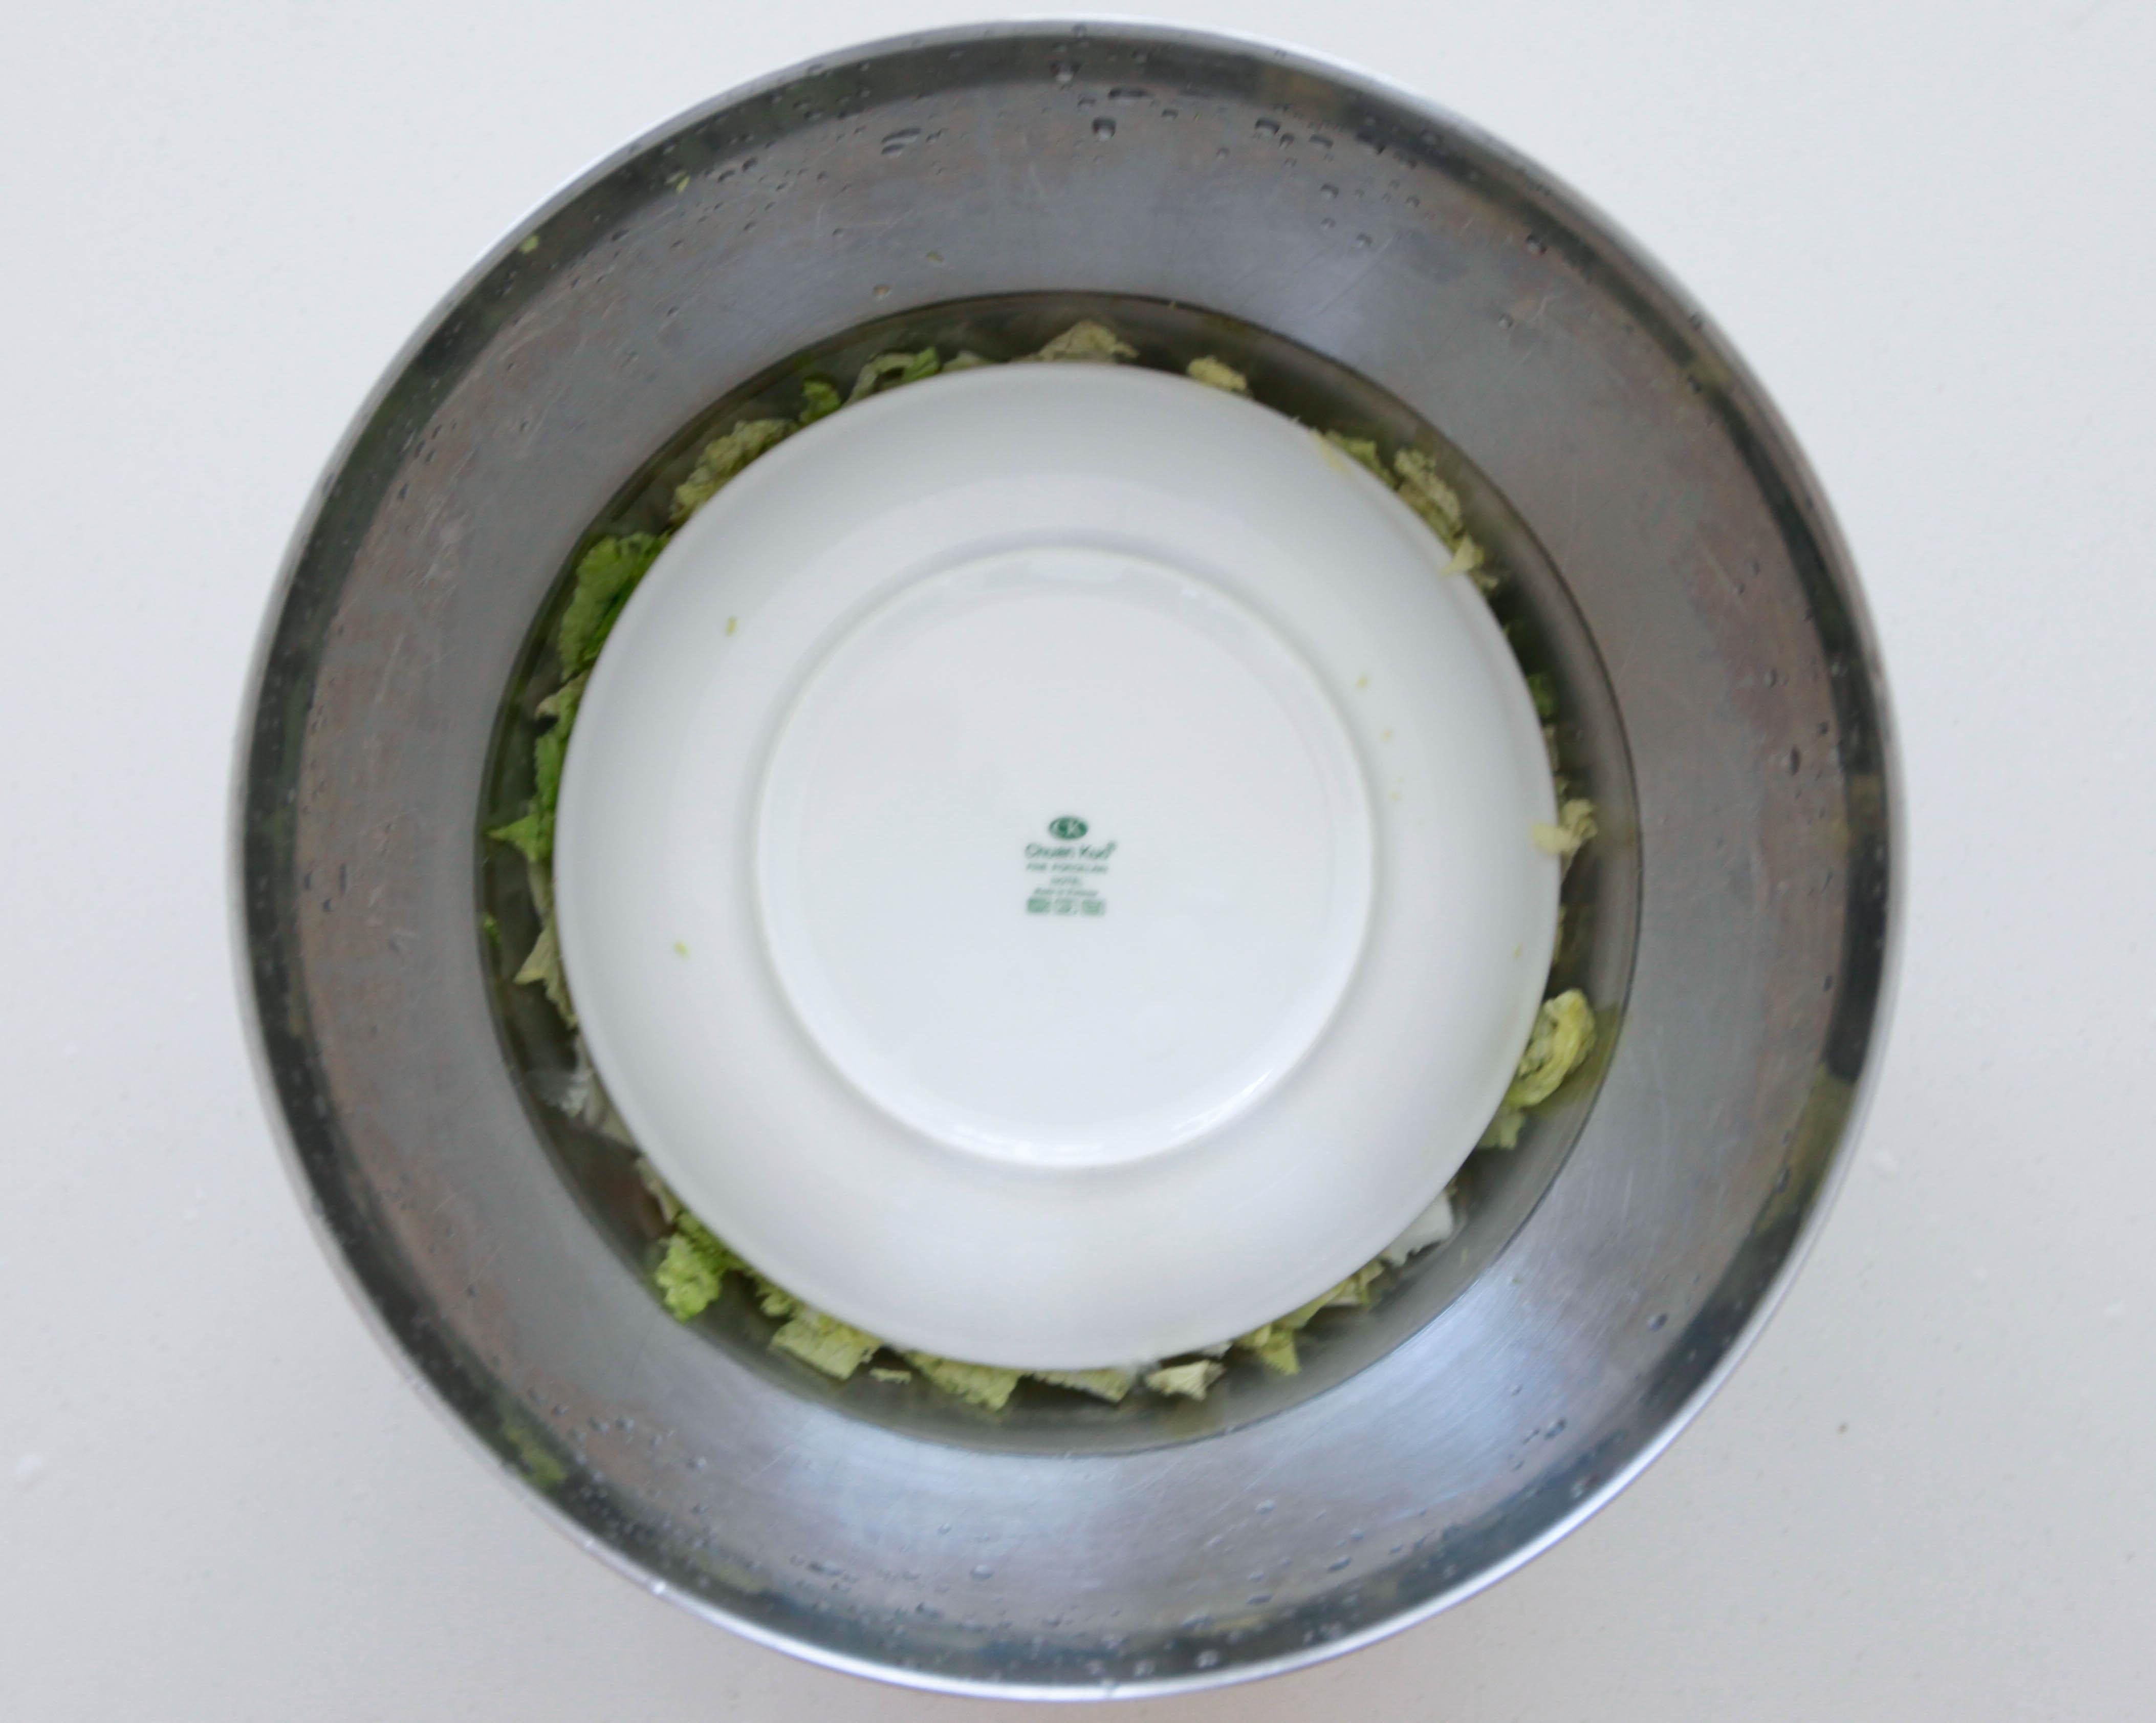 Picture of Prepare the Cabbage & Utensils